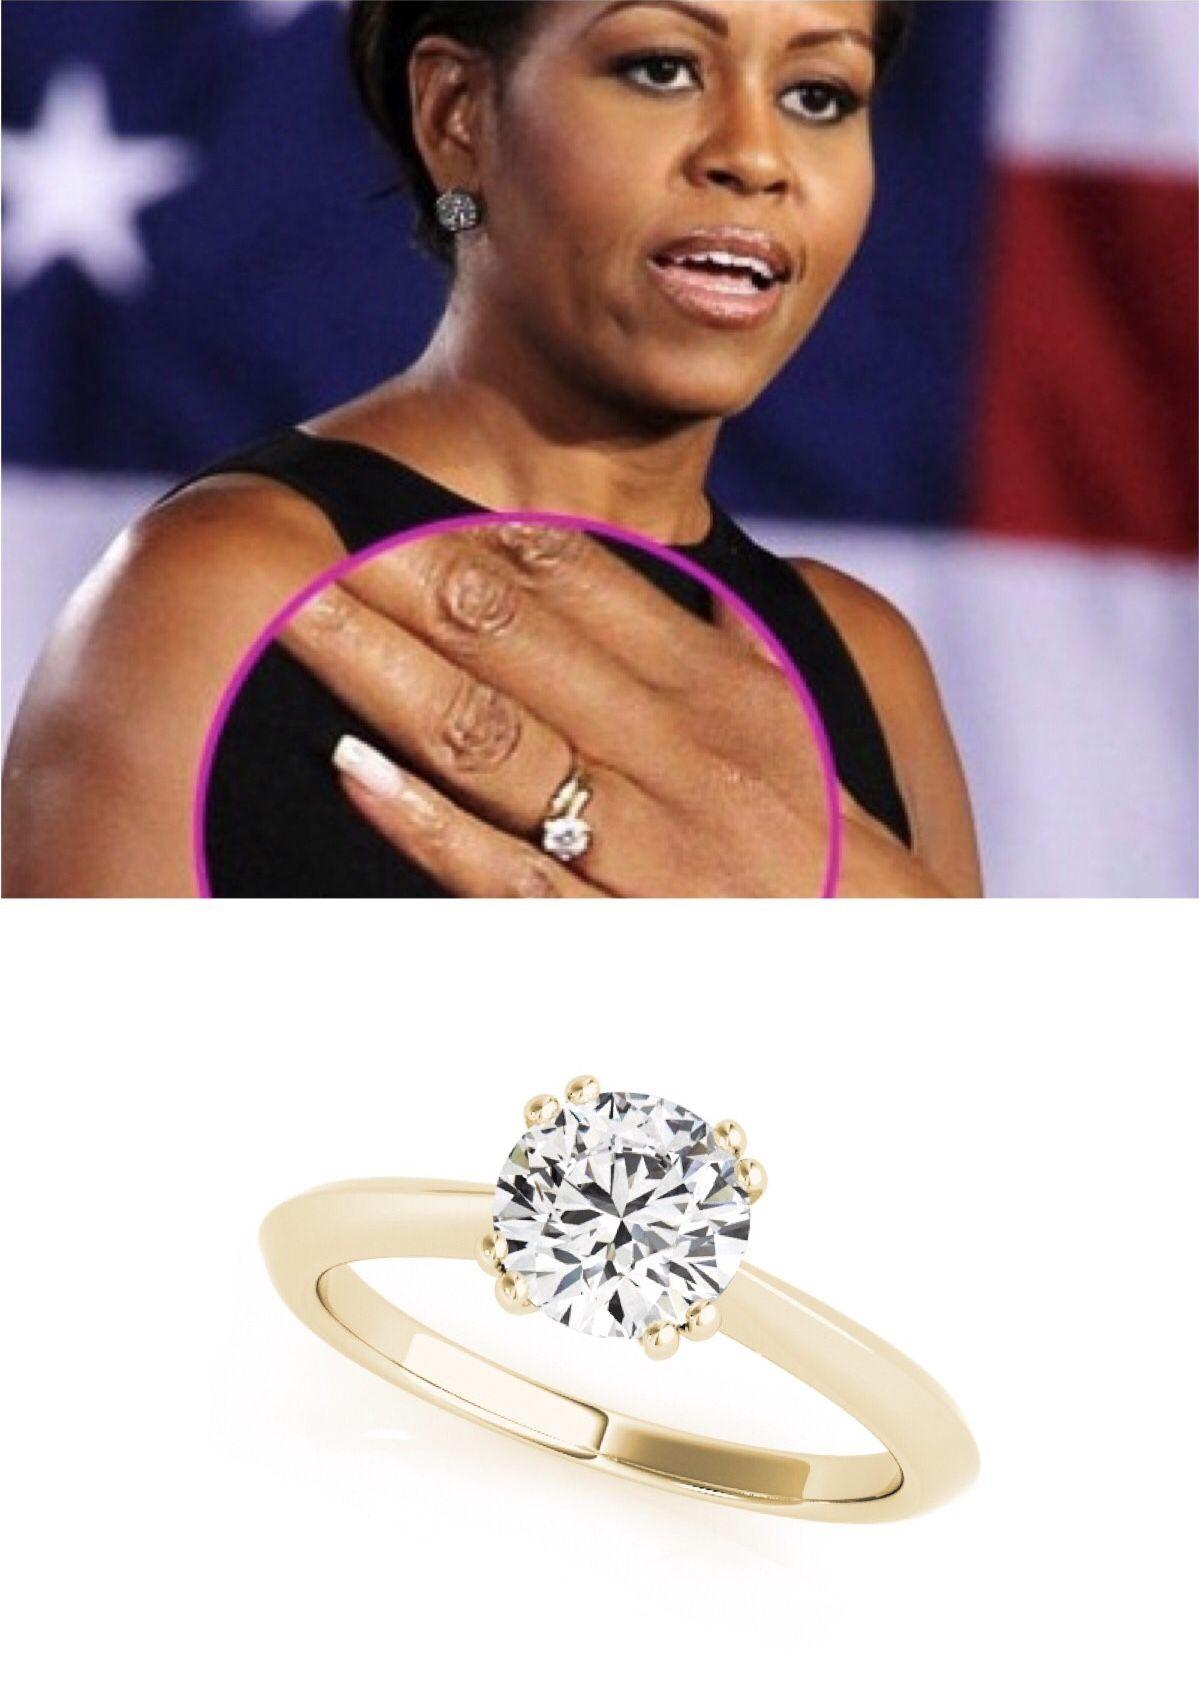 Diamond Solitaire Engagement Ring 18k Yellow Gold 1 07ct Solitaire Engagement Ring Yellow Gold Solitaire Engagement Ring Diamond Solitaire Engagement Ring